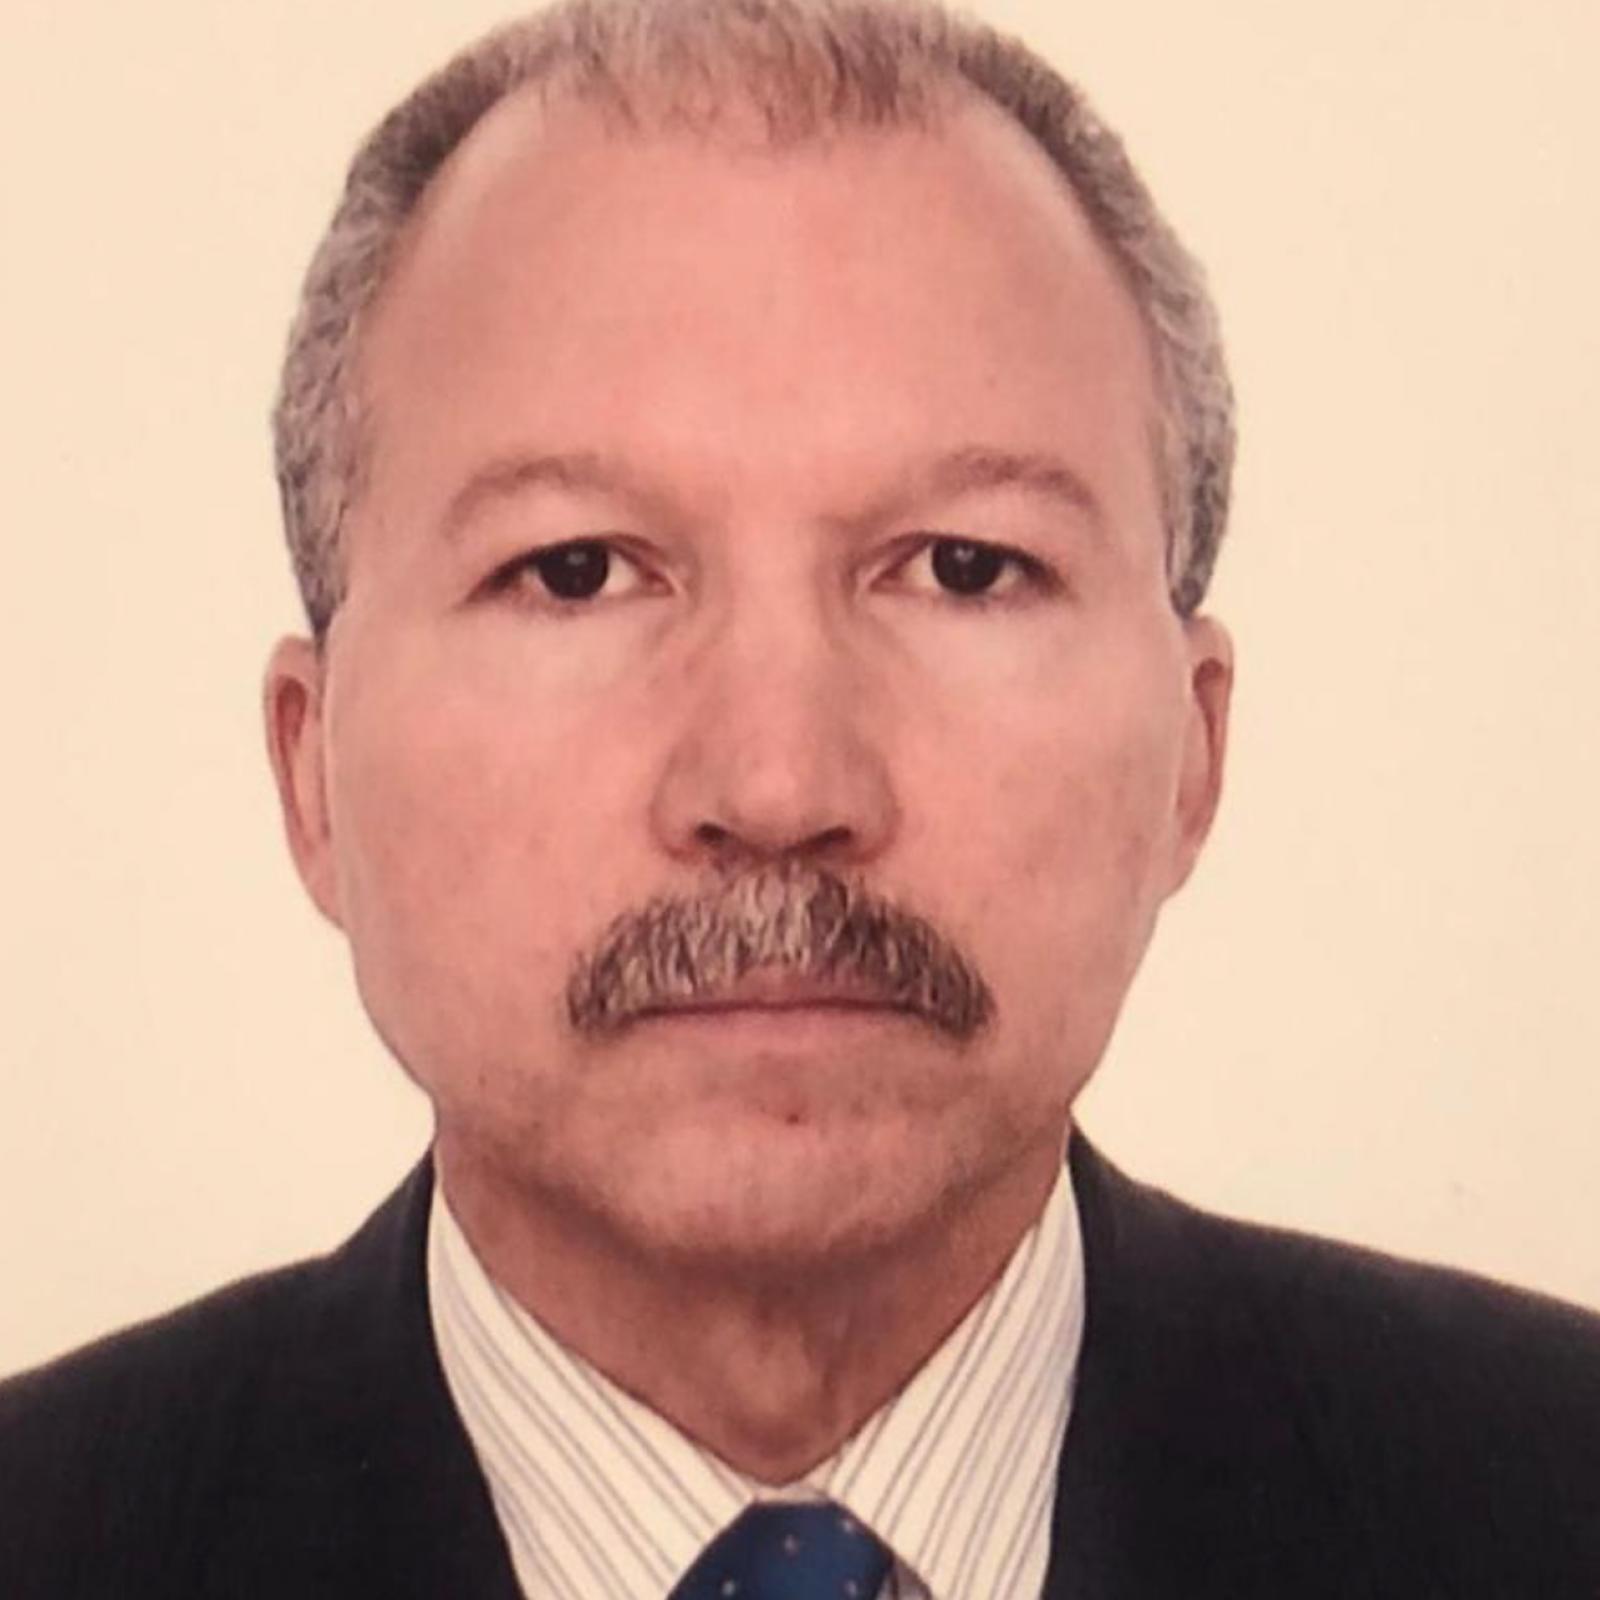 Dr. Argemiro Fragozo Maestre